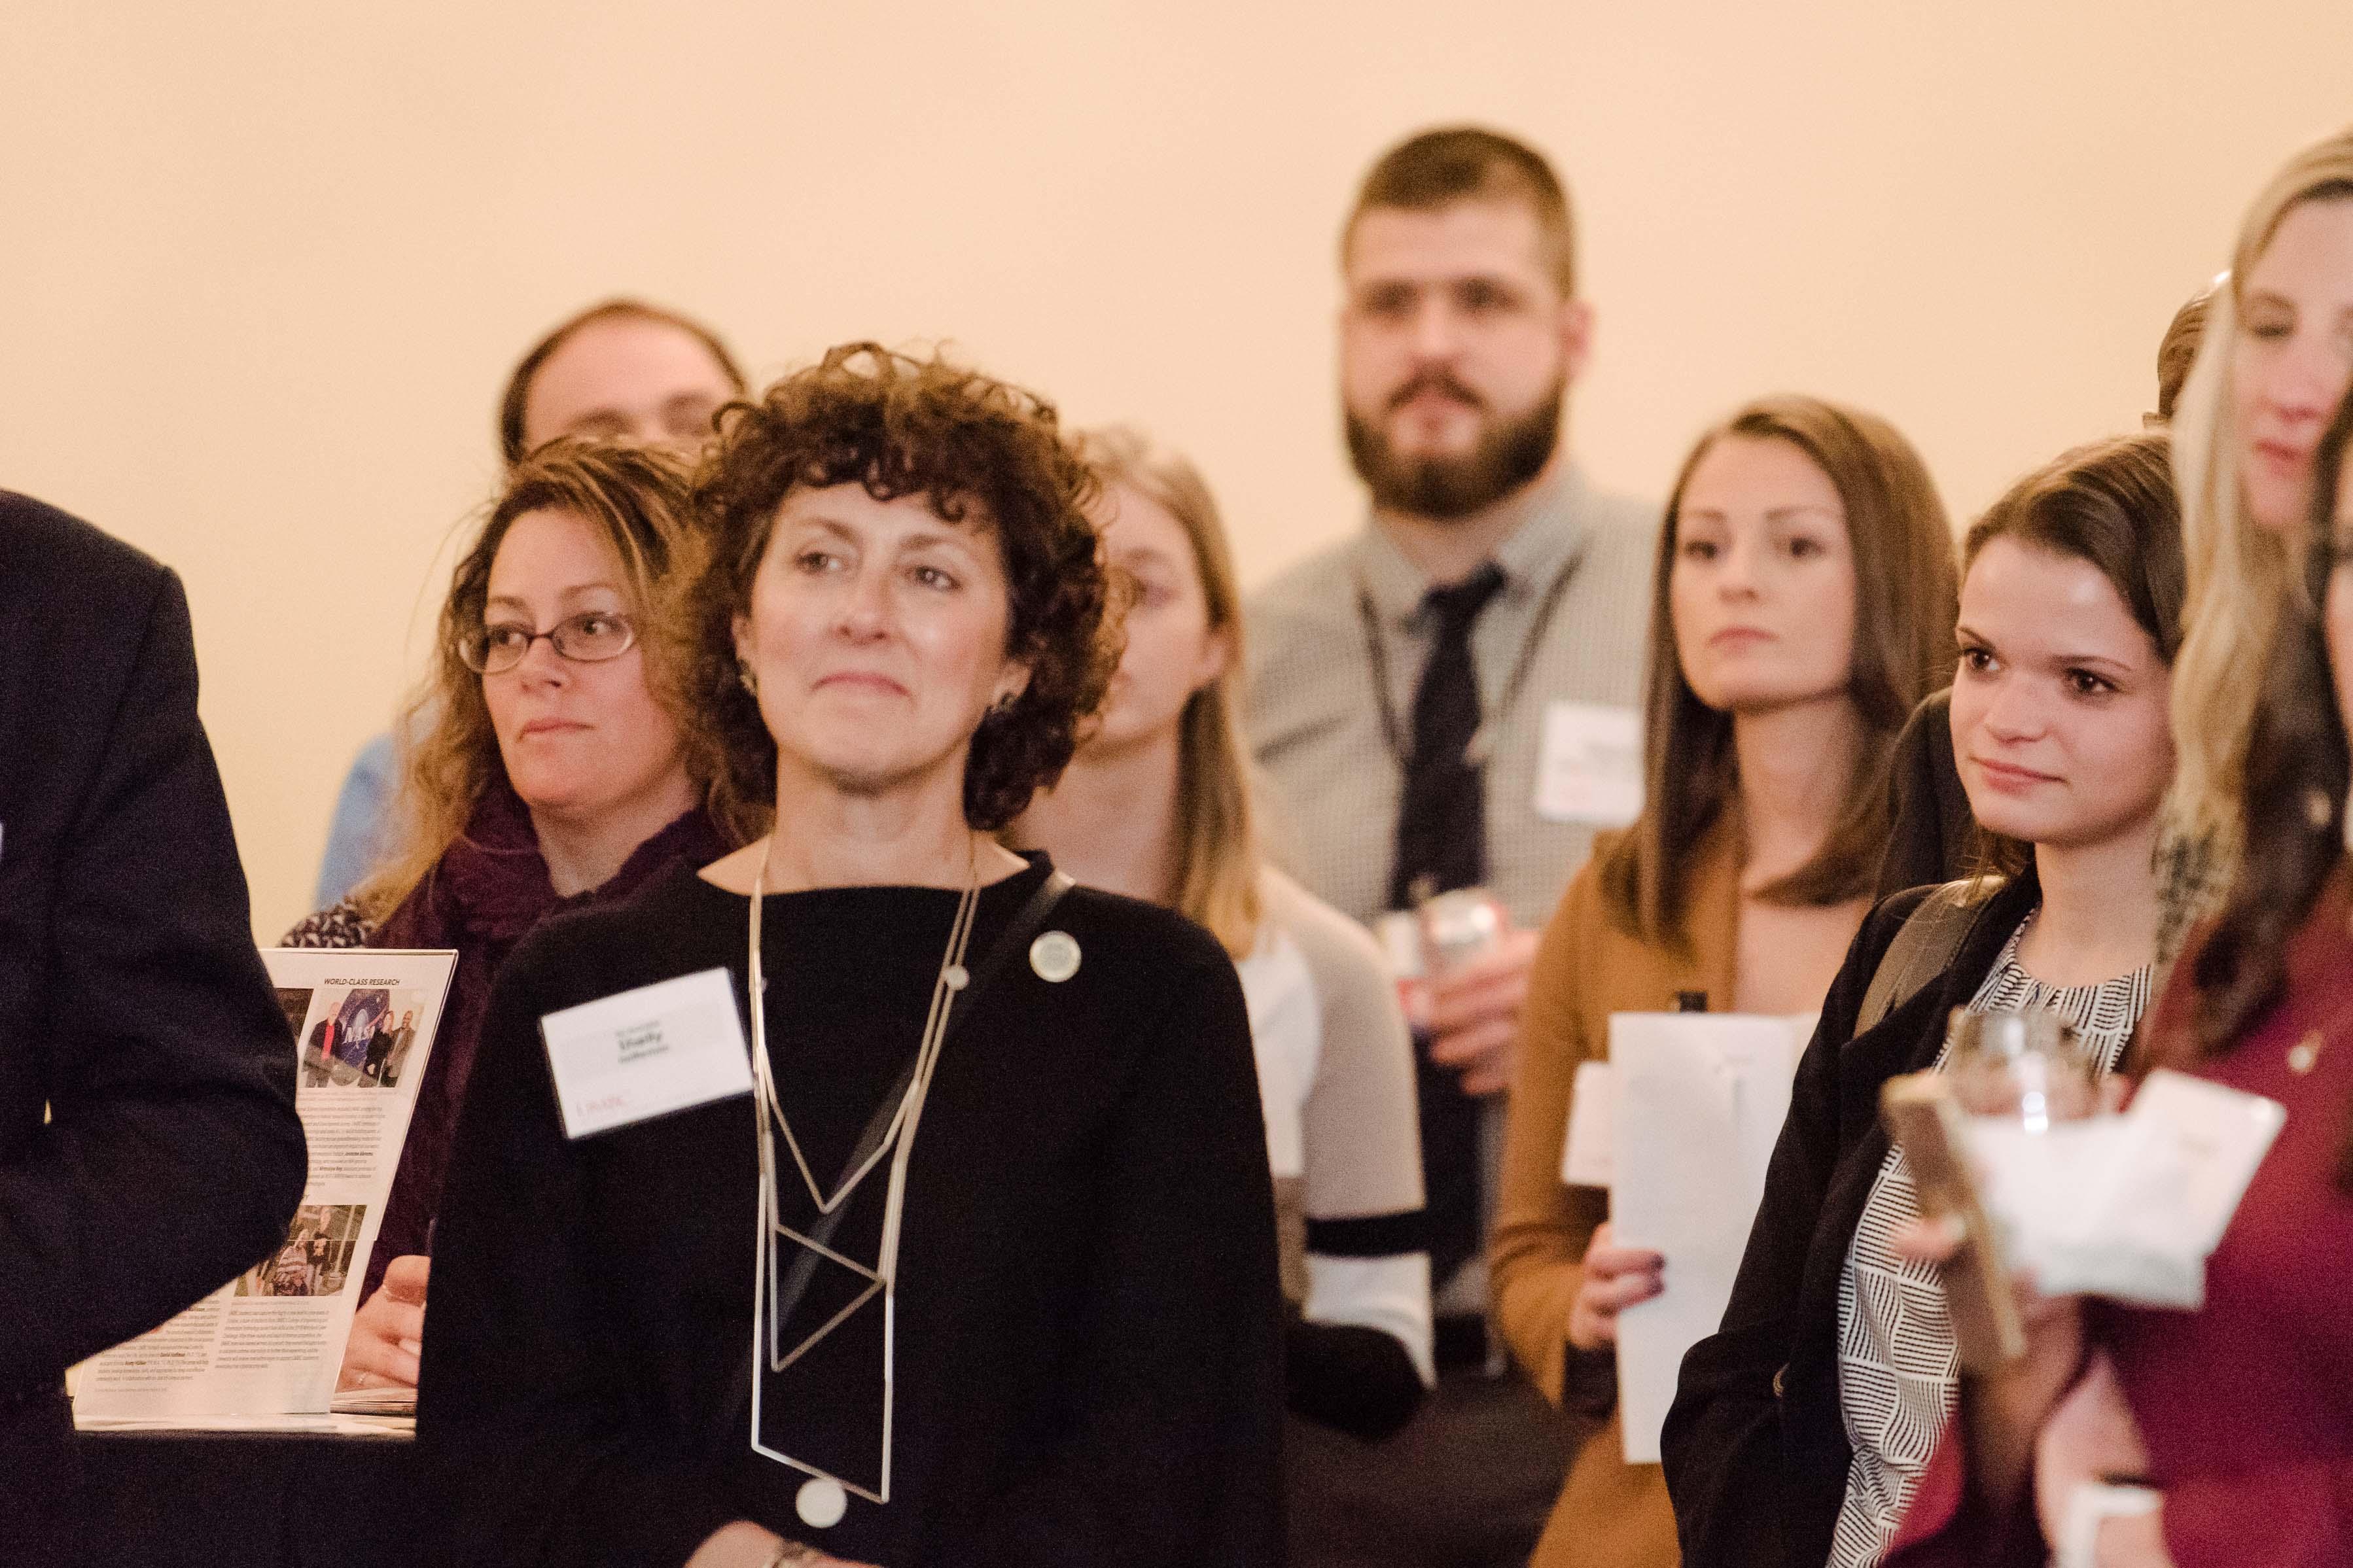 Senator Shelly Hettleman in crowd at Annapolis Alumni Reception